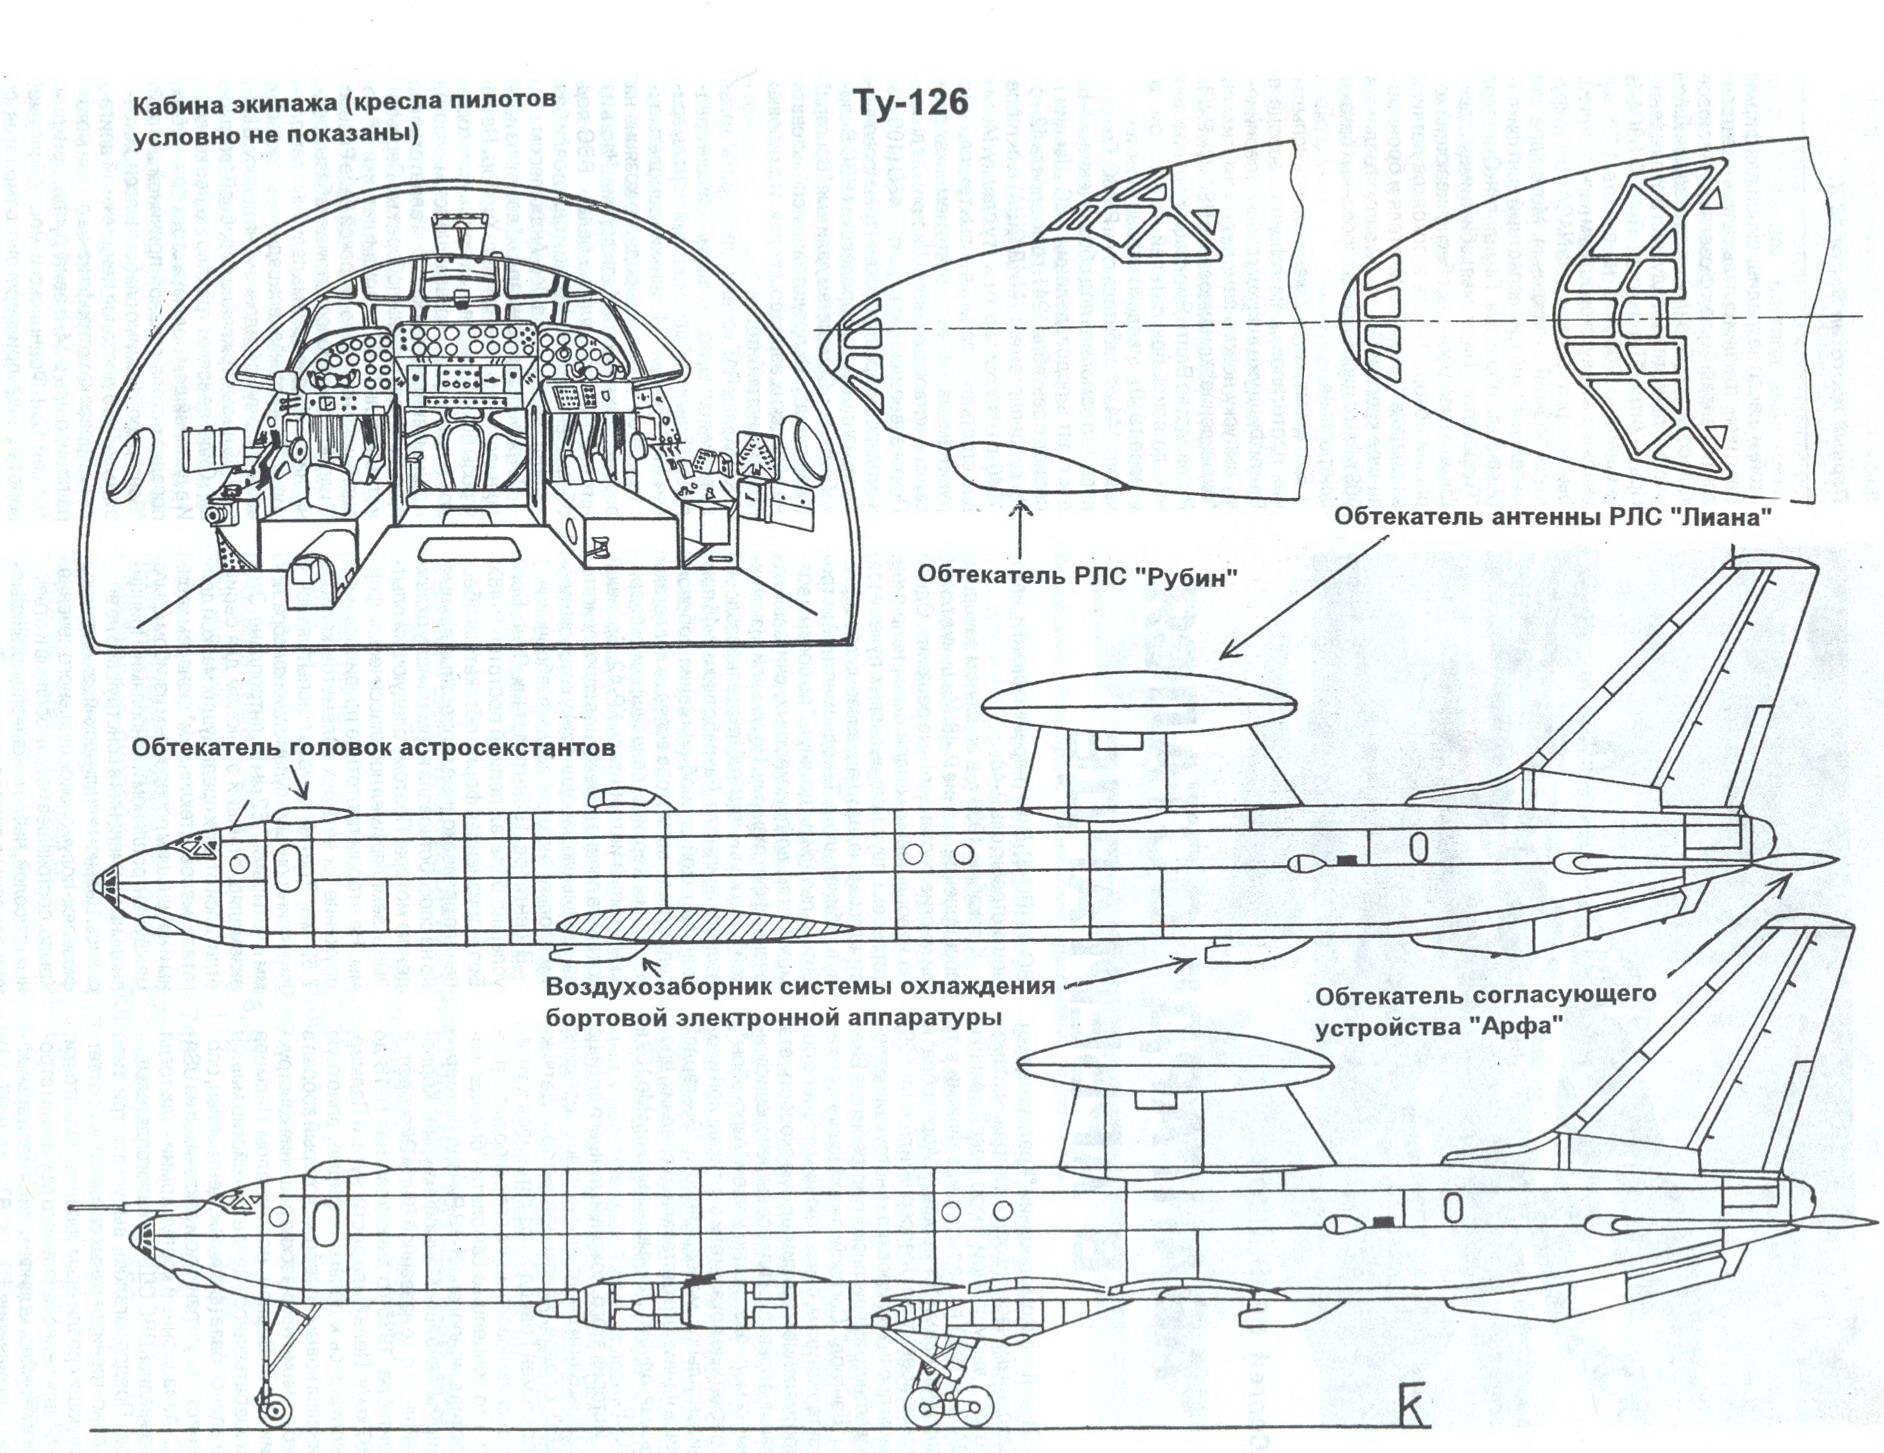 Tu-126 blueprint